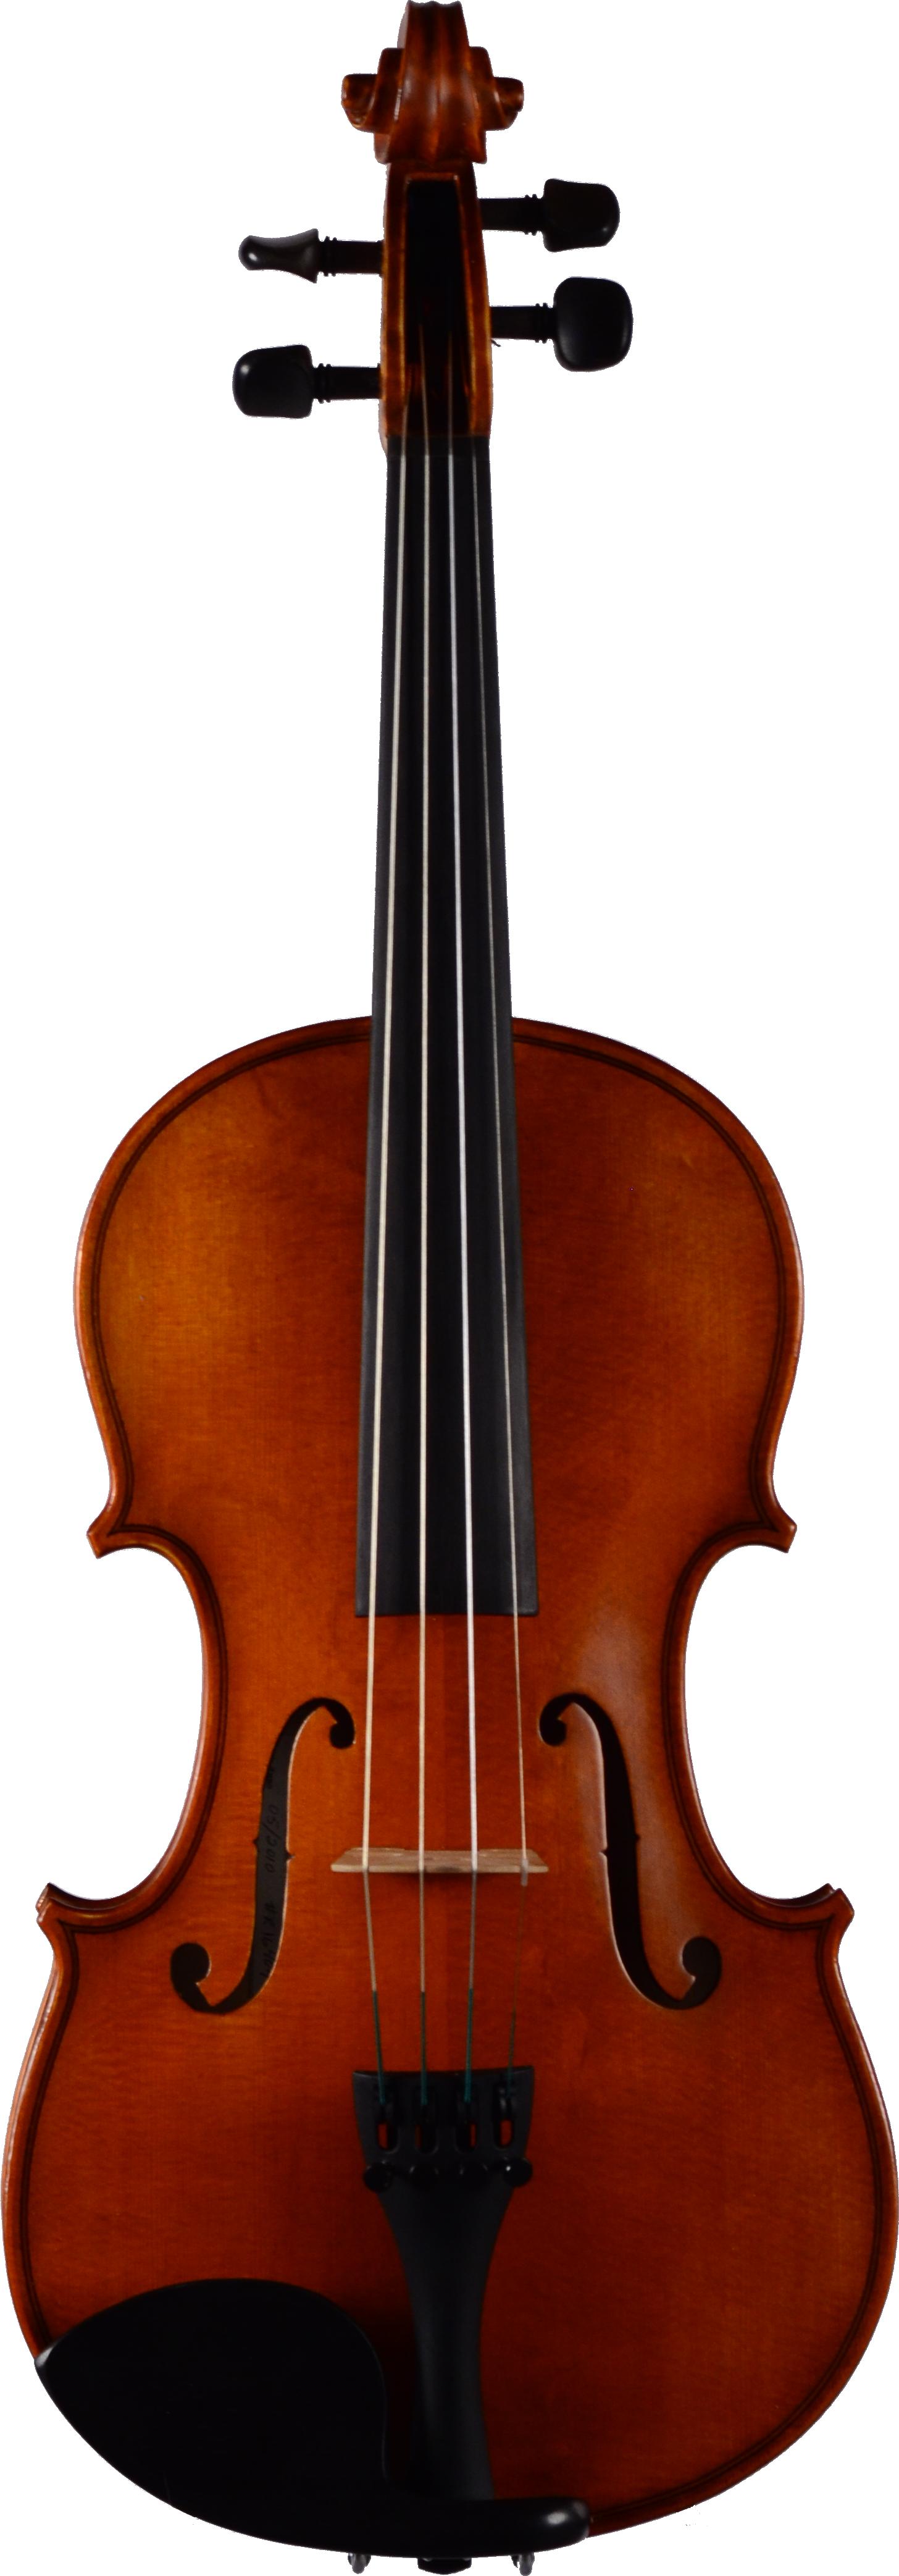 Keith, Curtis & Clifton KCC-R32V Violin | Atlantic Strings